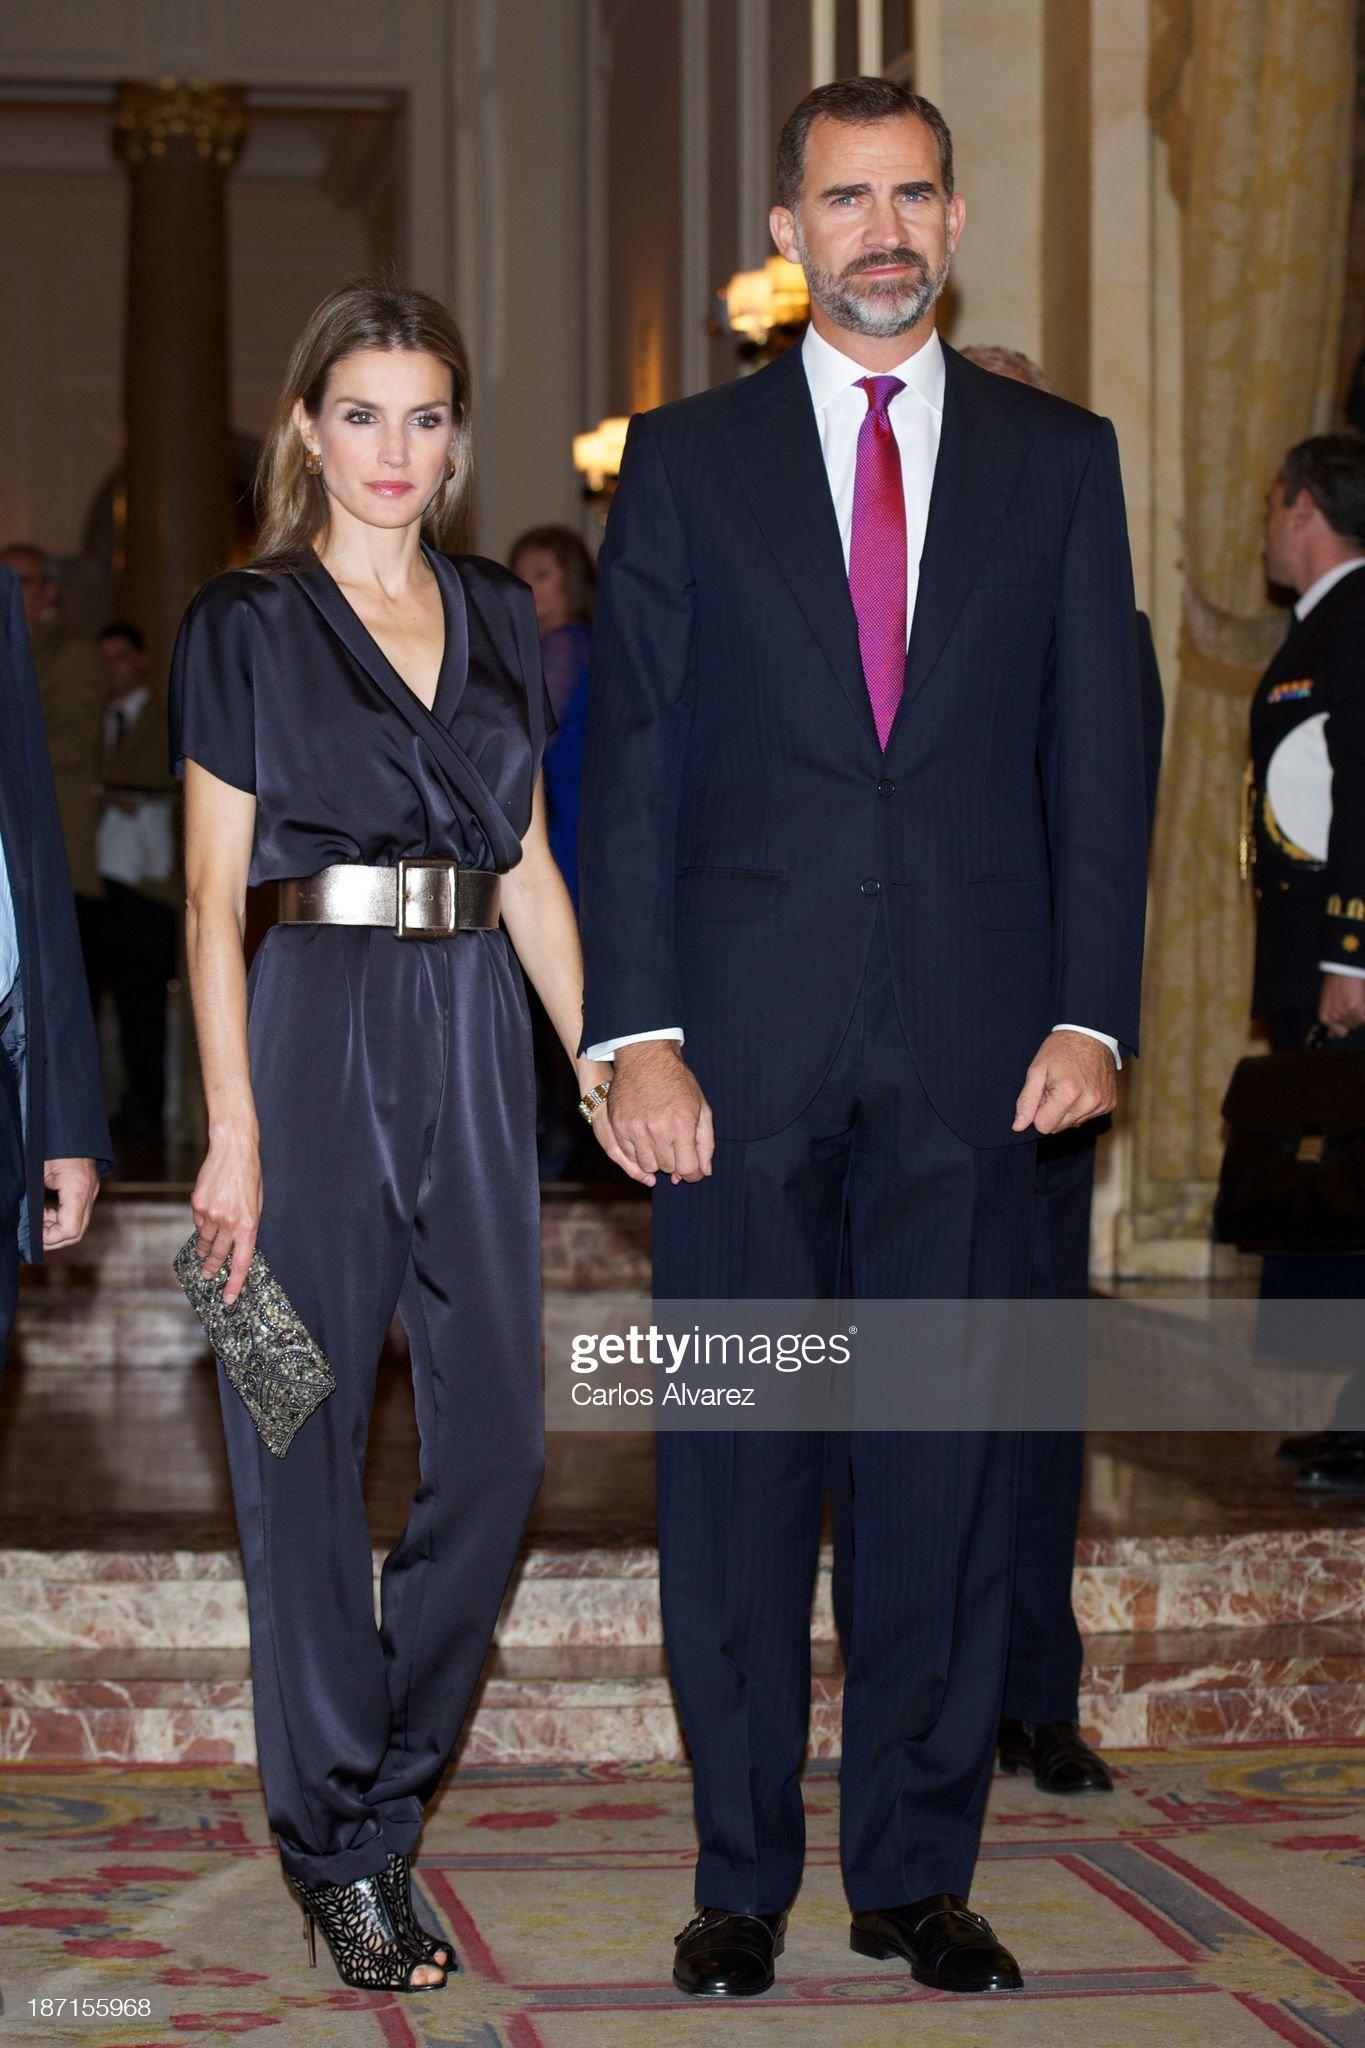 Spanish Royals Attend 'Francisco Cerecedo' Journalism Awards 2013 : News Photo